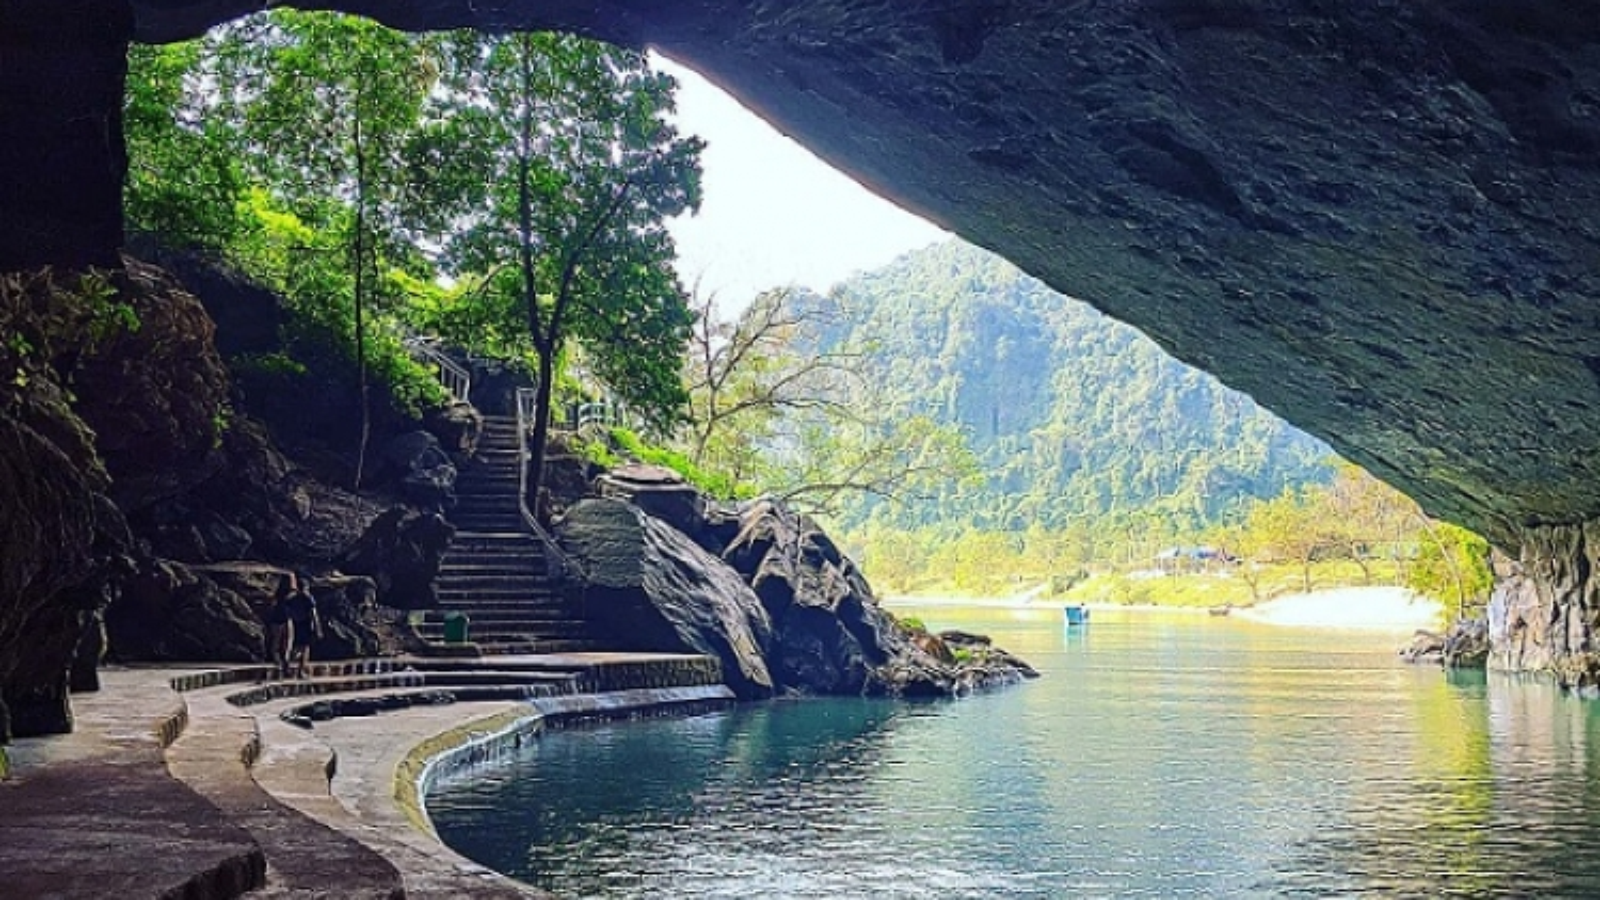 Phong Nha-Ke Bang National Park tops hospitable destination list